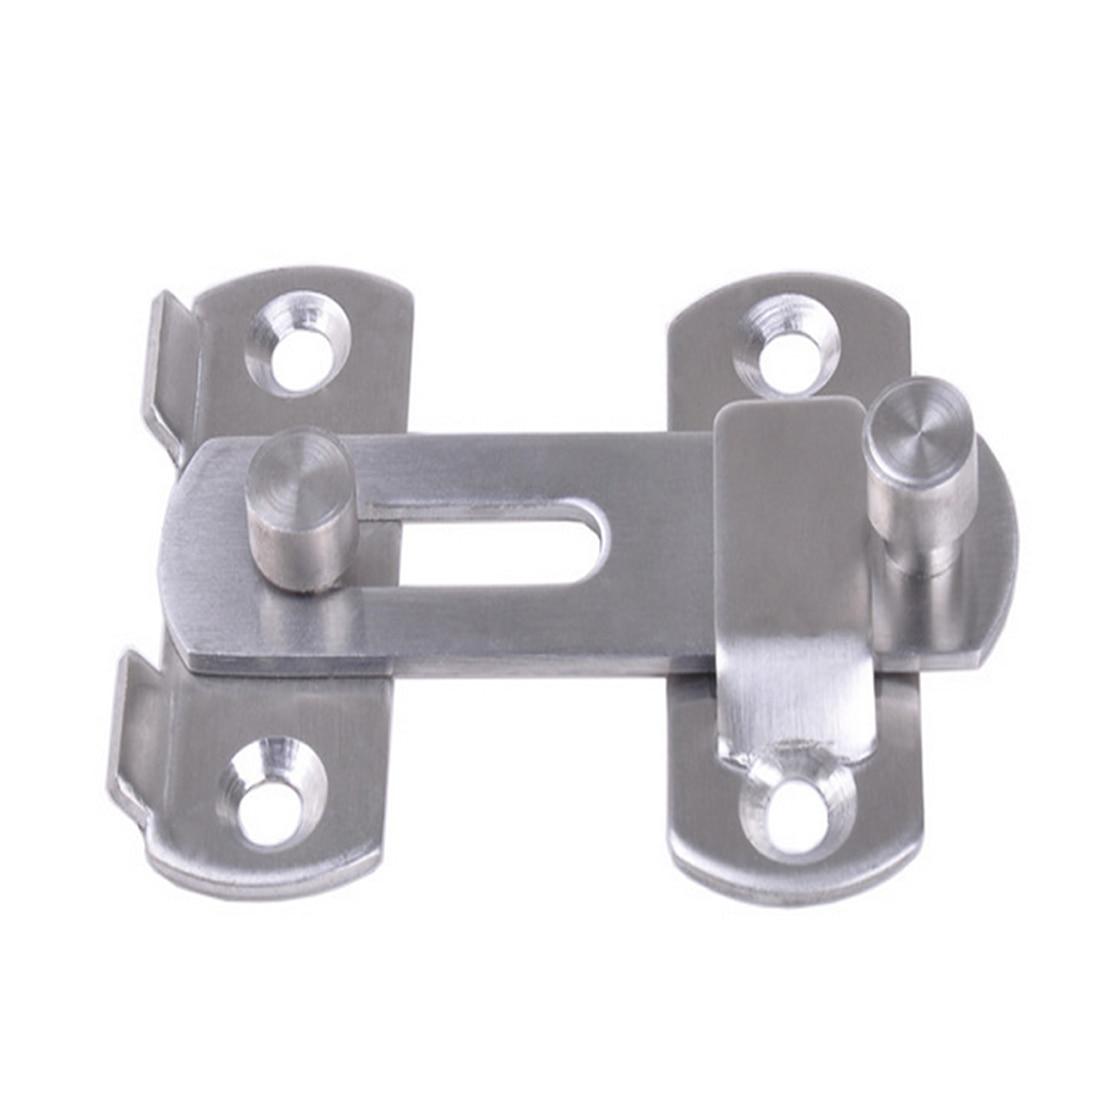 2 pc Gold Metal Latch Hasp Staple Cabinet Gate Door Lock Set Safety Hardware